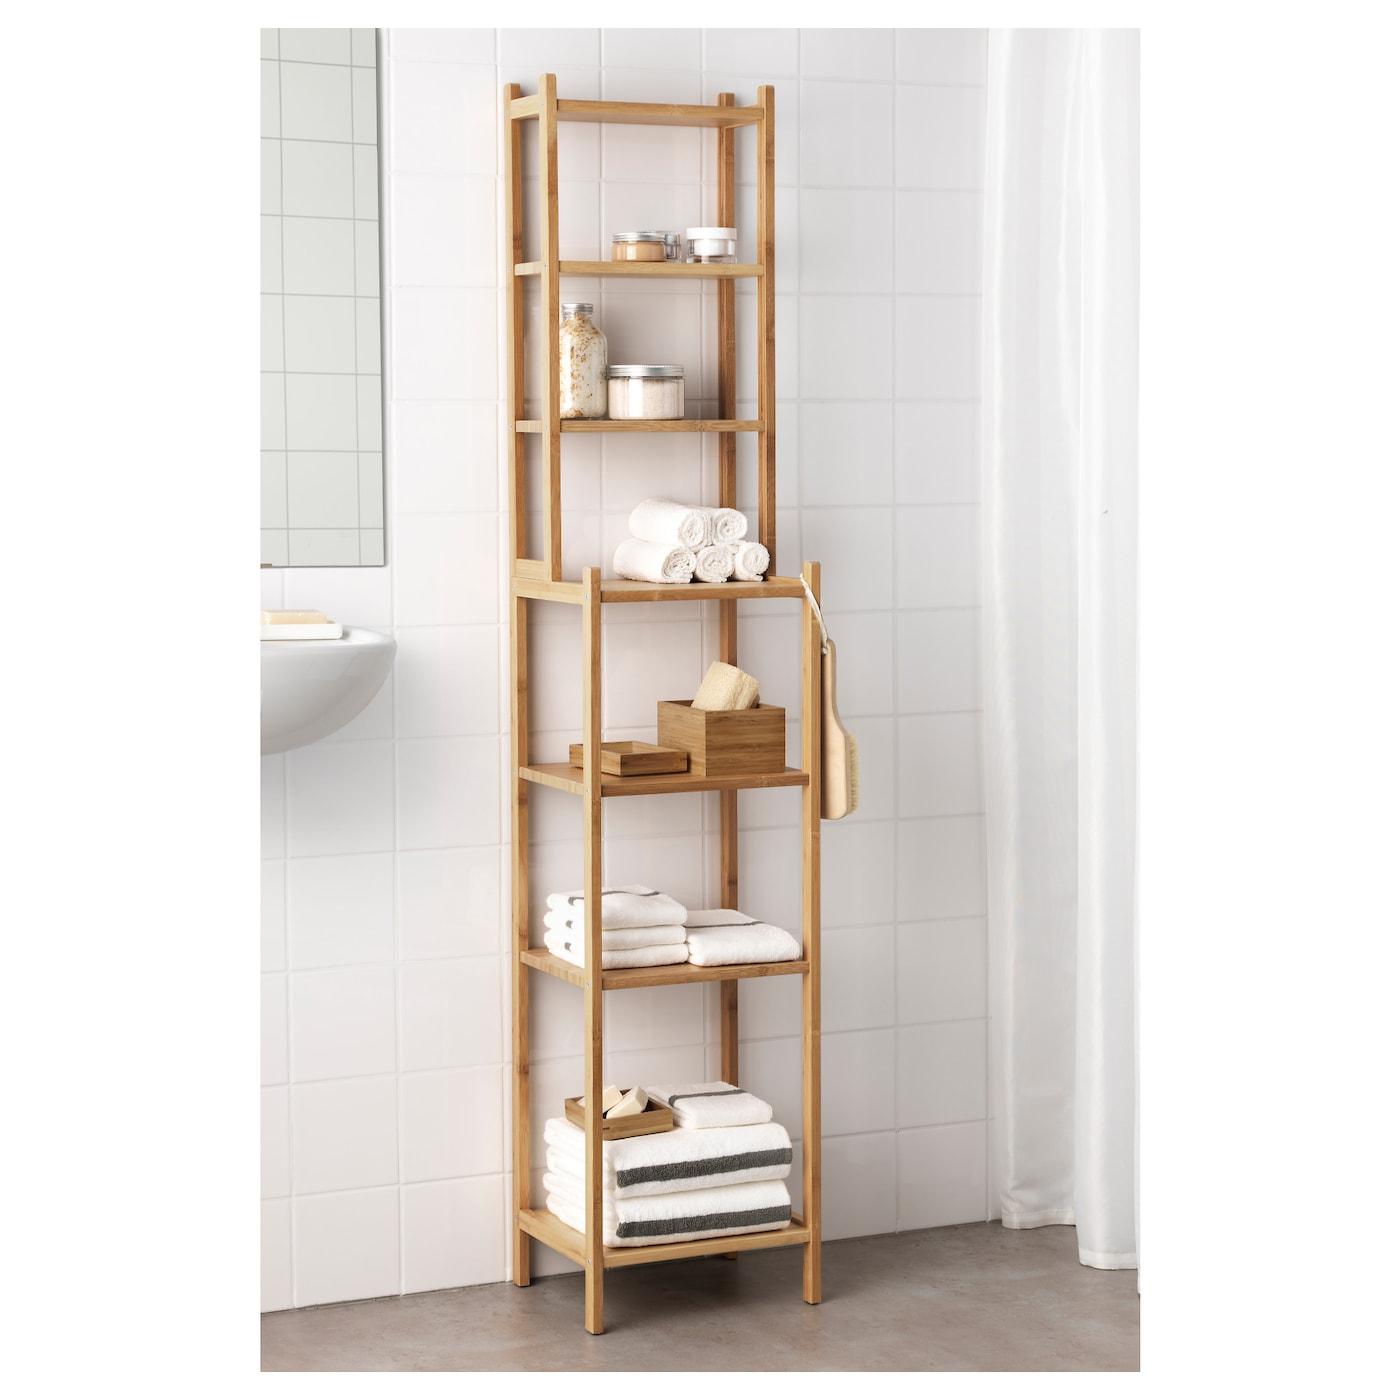 Picture of: Ragrund Reol Bambus 33 Cm Ikea